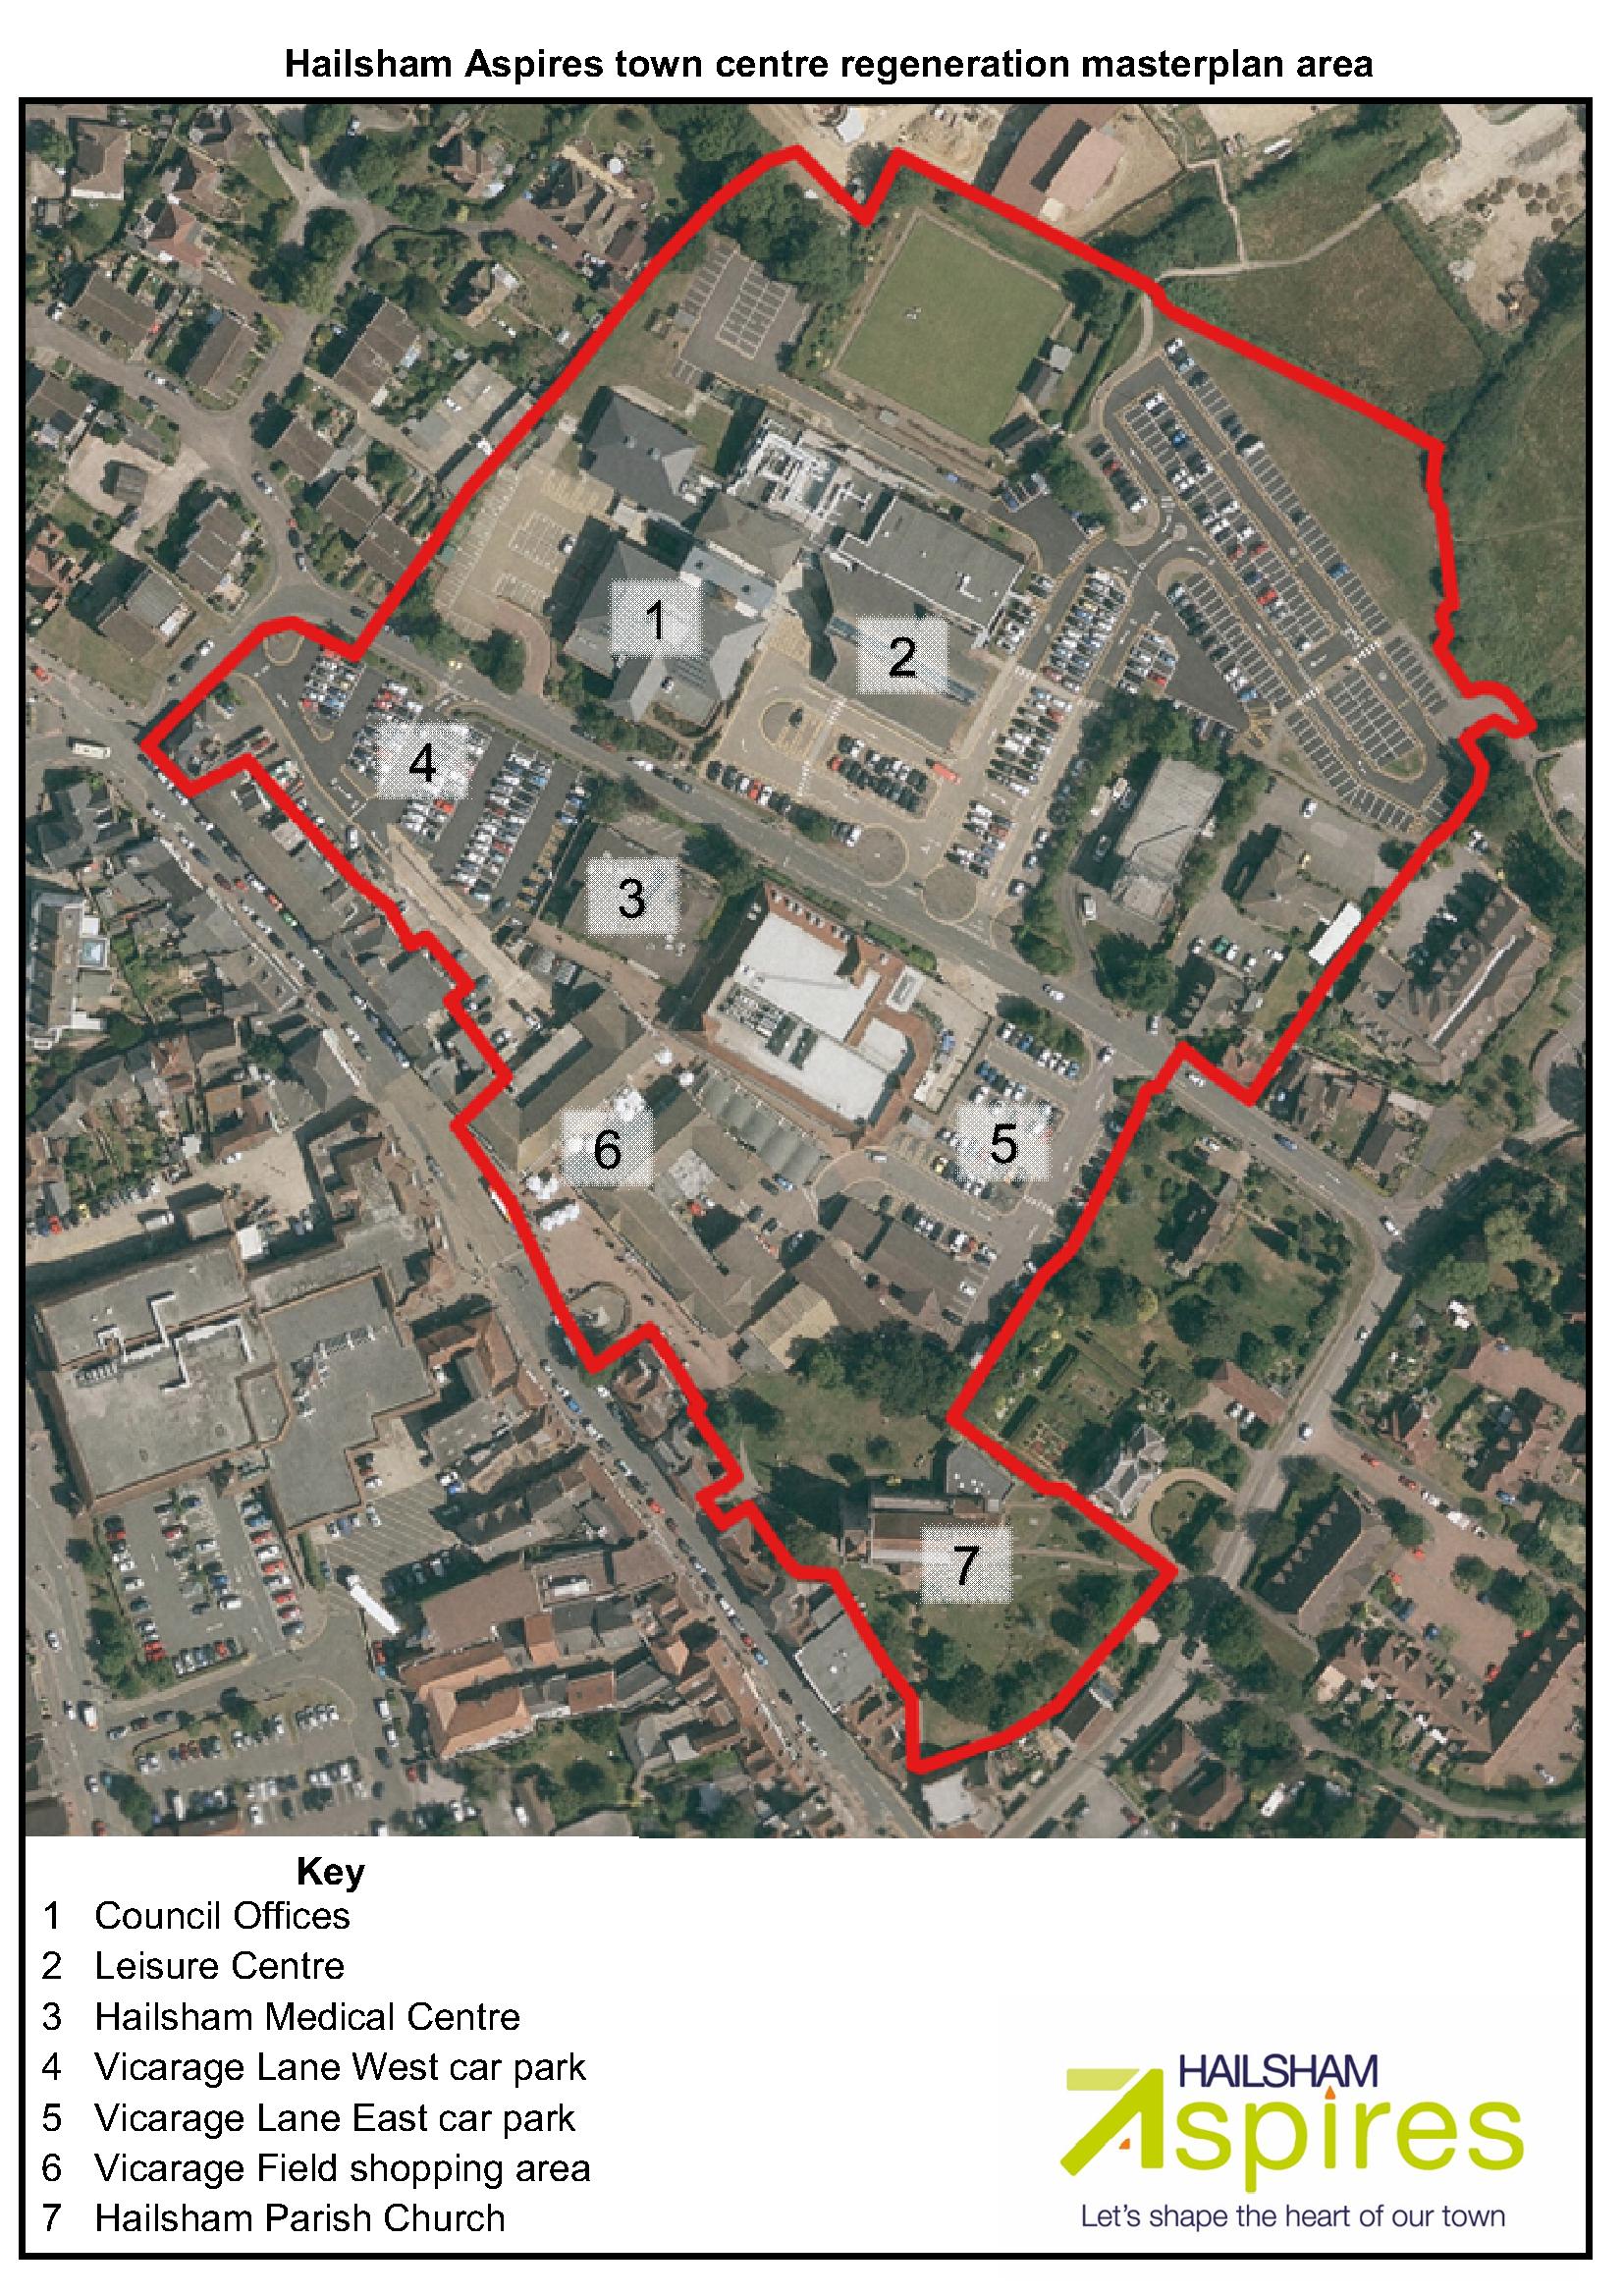 Ariel view of Hailsham Aspires town centre regeneration masterplan area